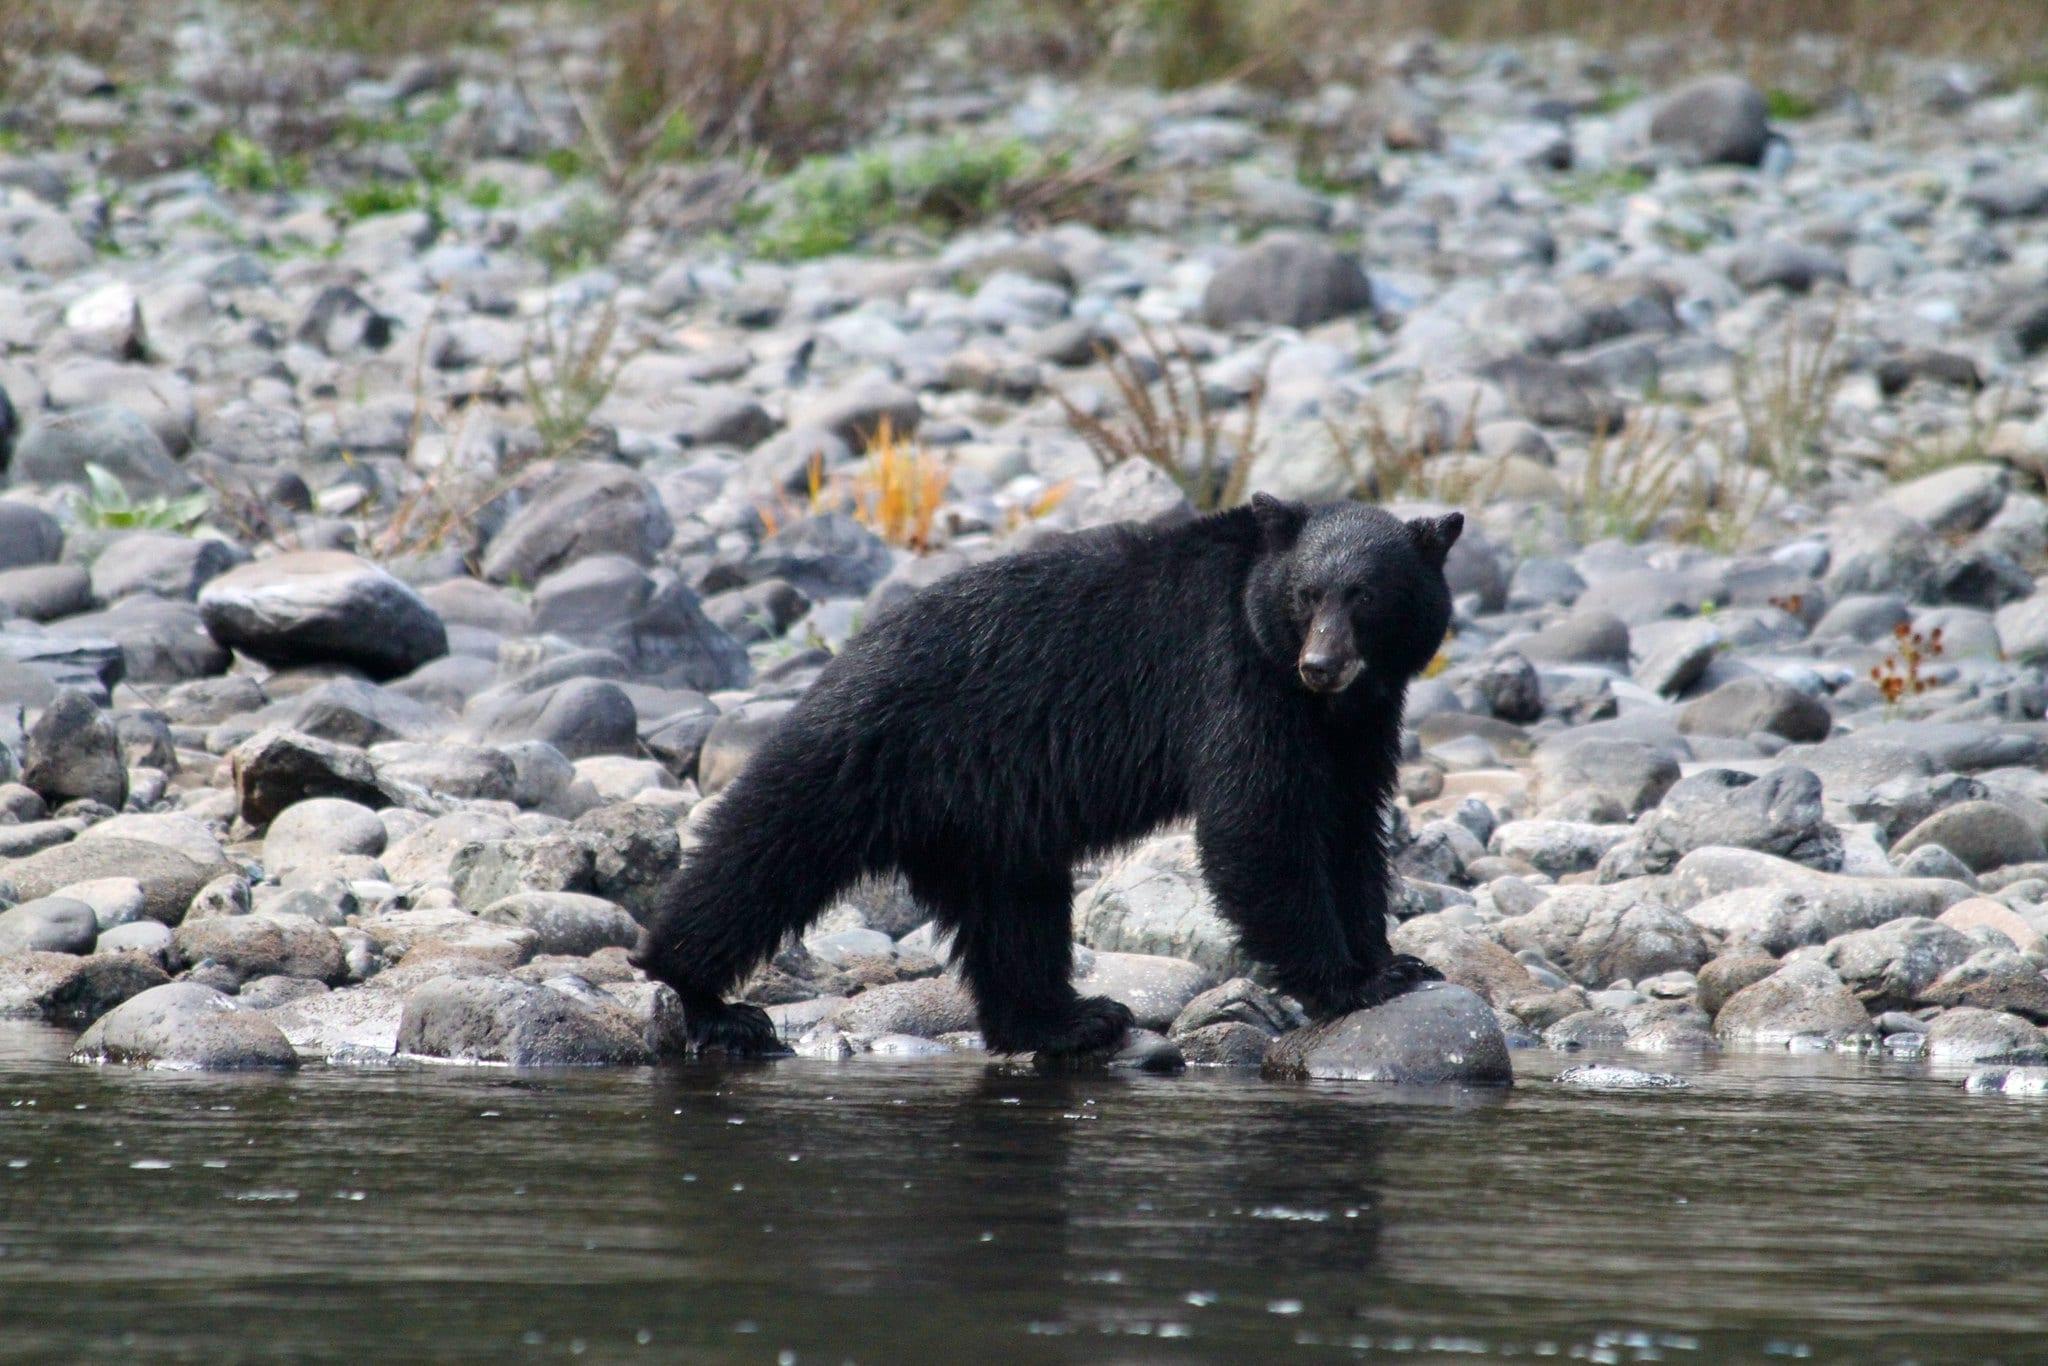 Black bear-Momentum